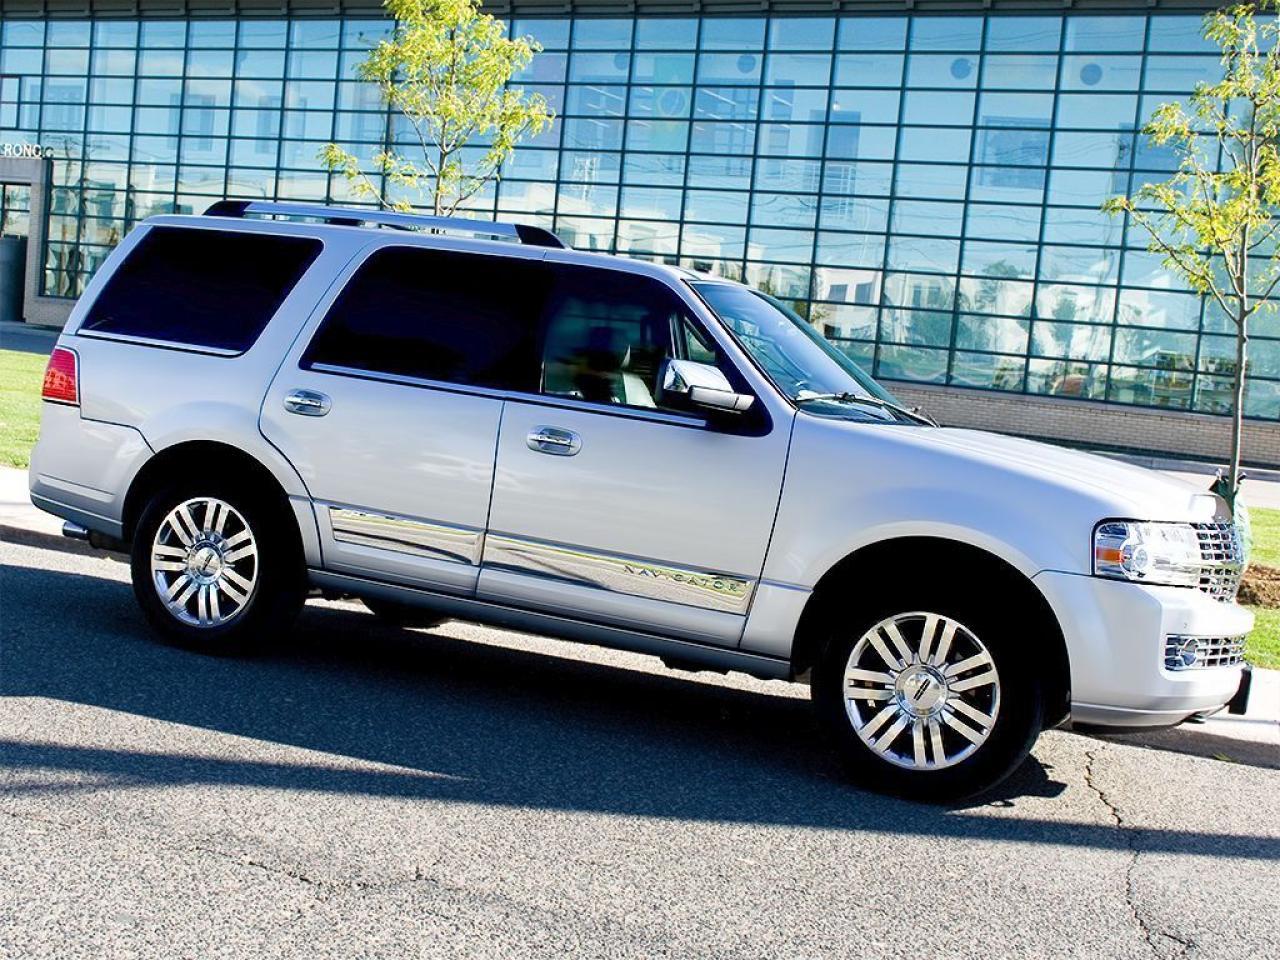 2011 Lincoln Navigator ULTIMATE|NAVI|DUAL DVD|REARCAM|PWR. RUNNING BOARDS